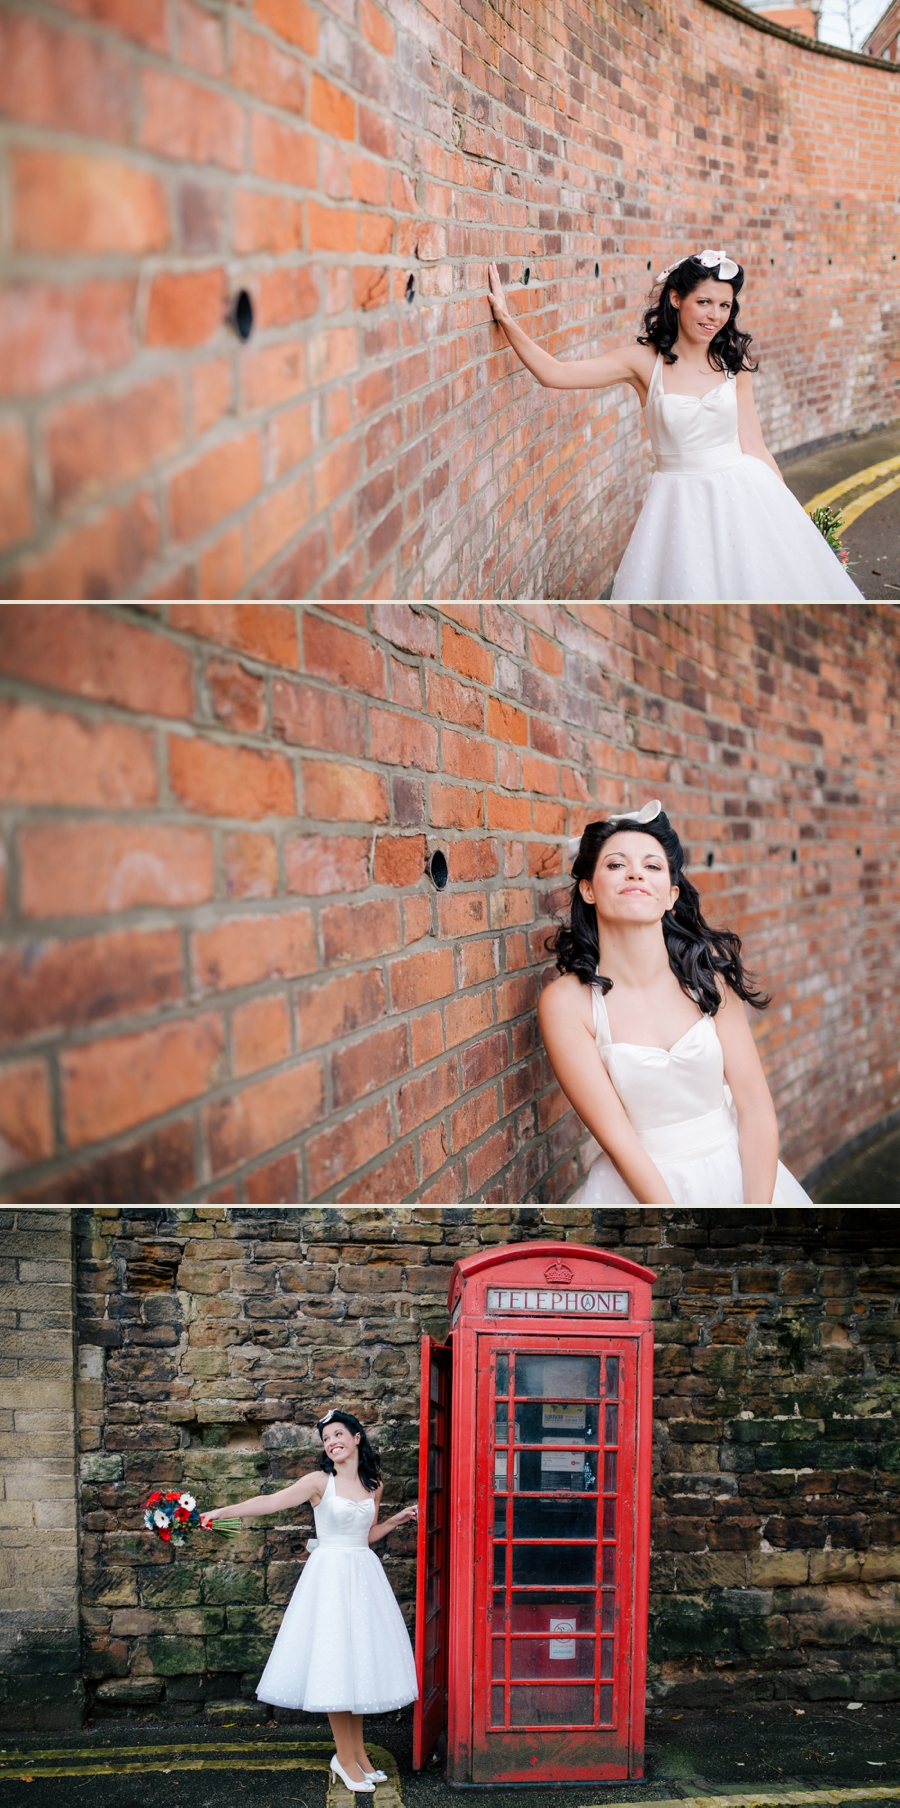 Somerset Wedding Photographer Nottingham Council House Wedding Angela and Darren_0026.jpg